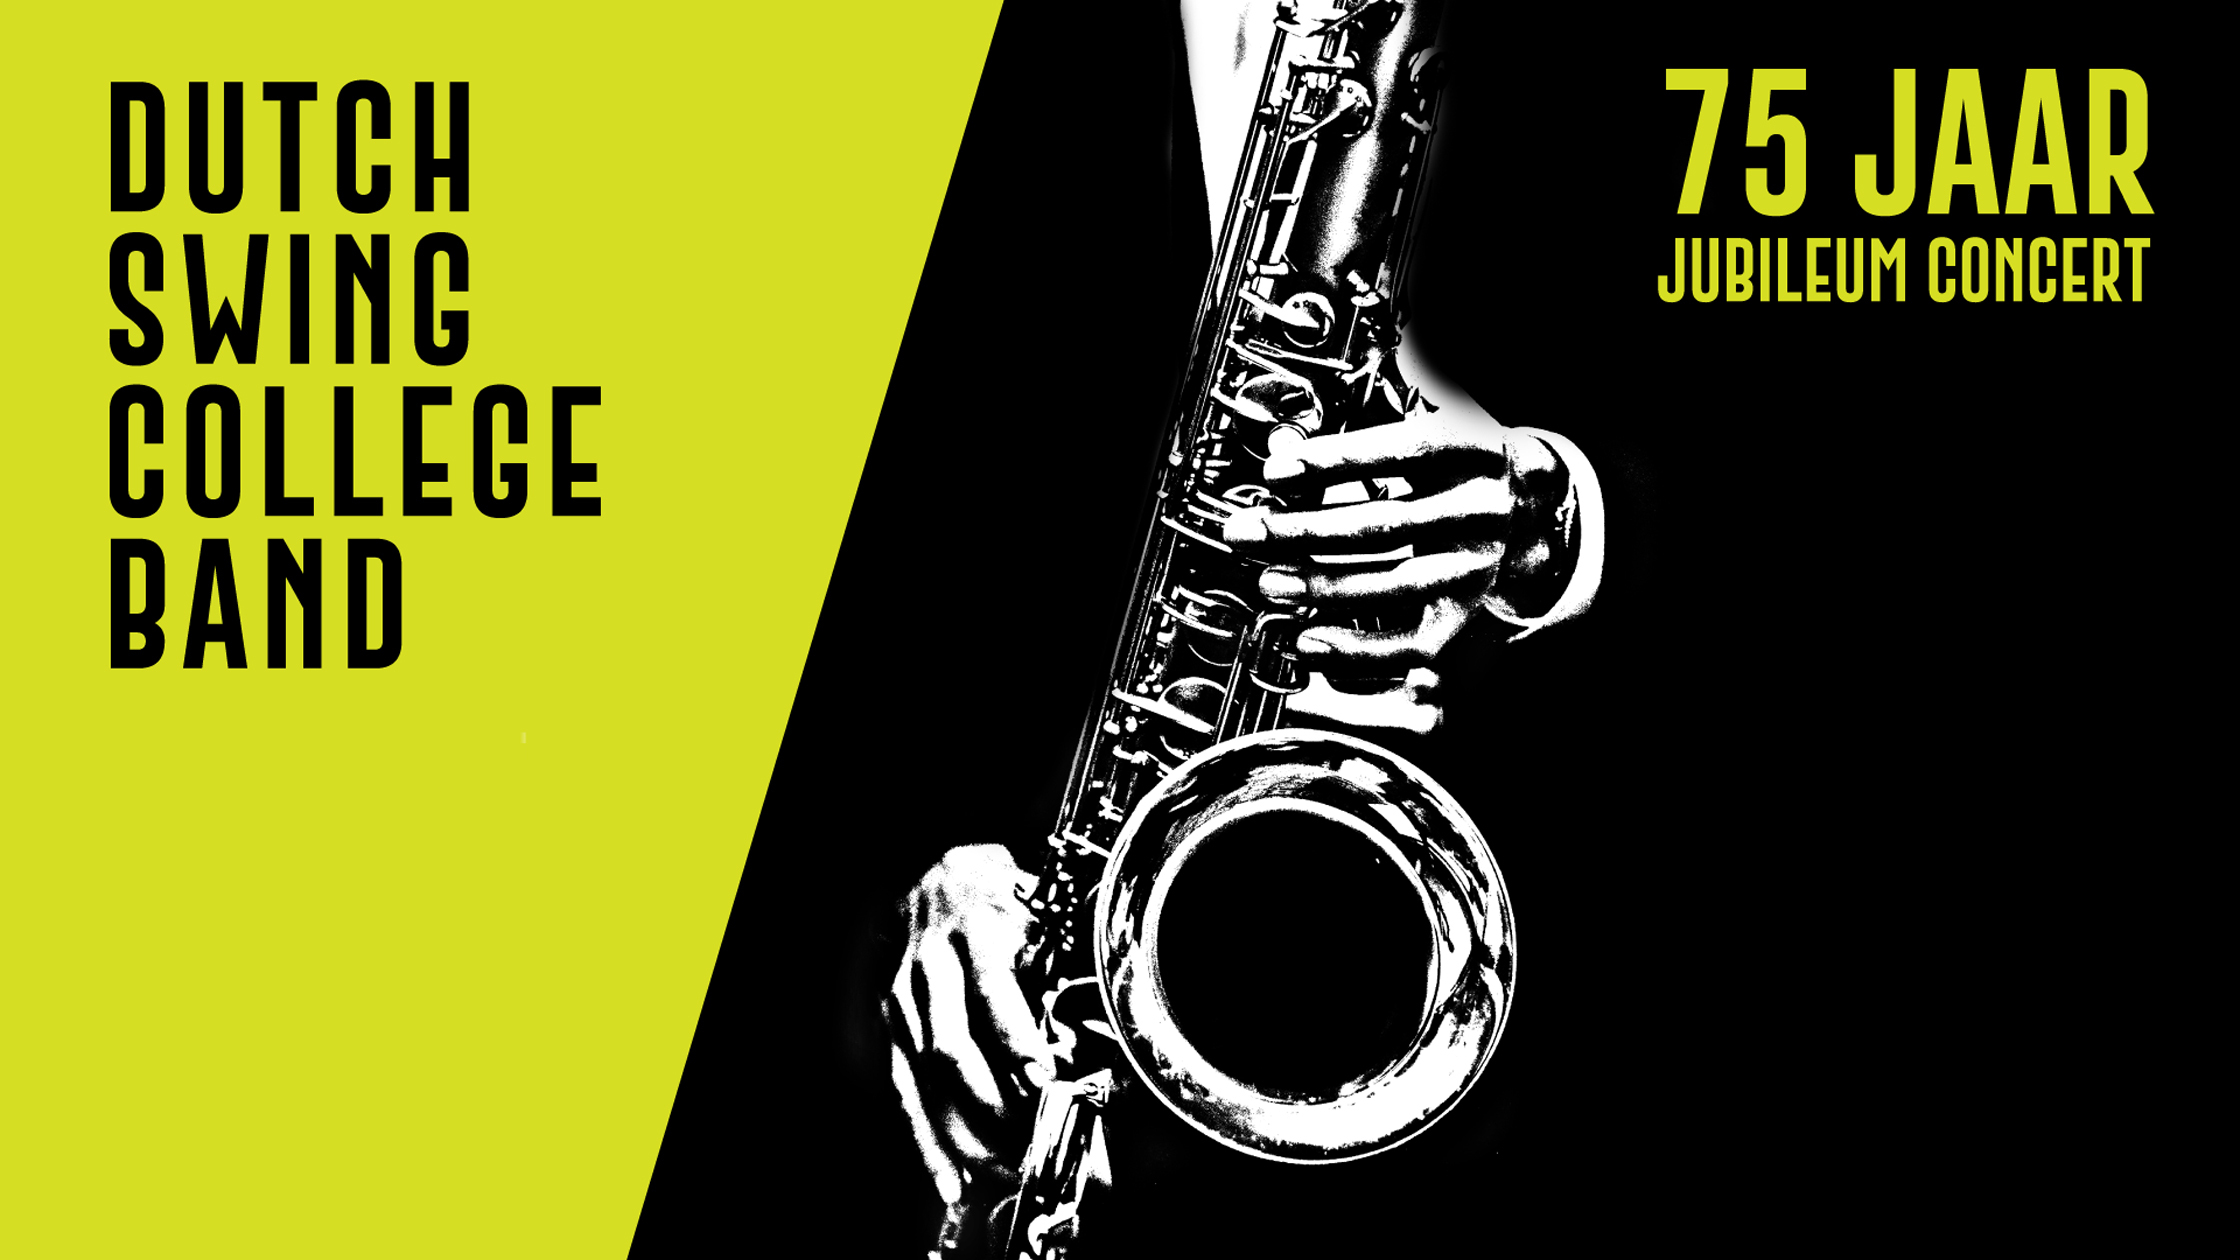 Dutch Swing college Band 75 jaar Jubileumconcert